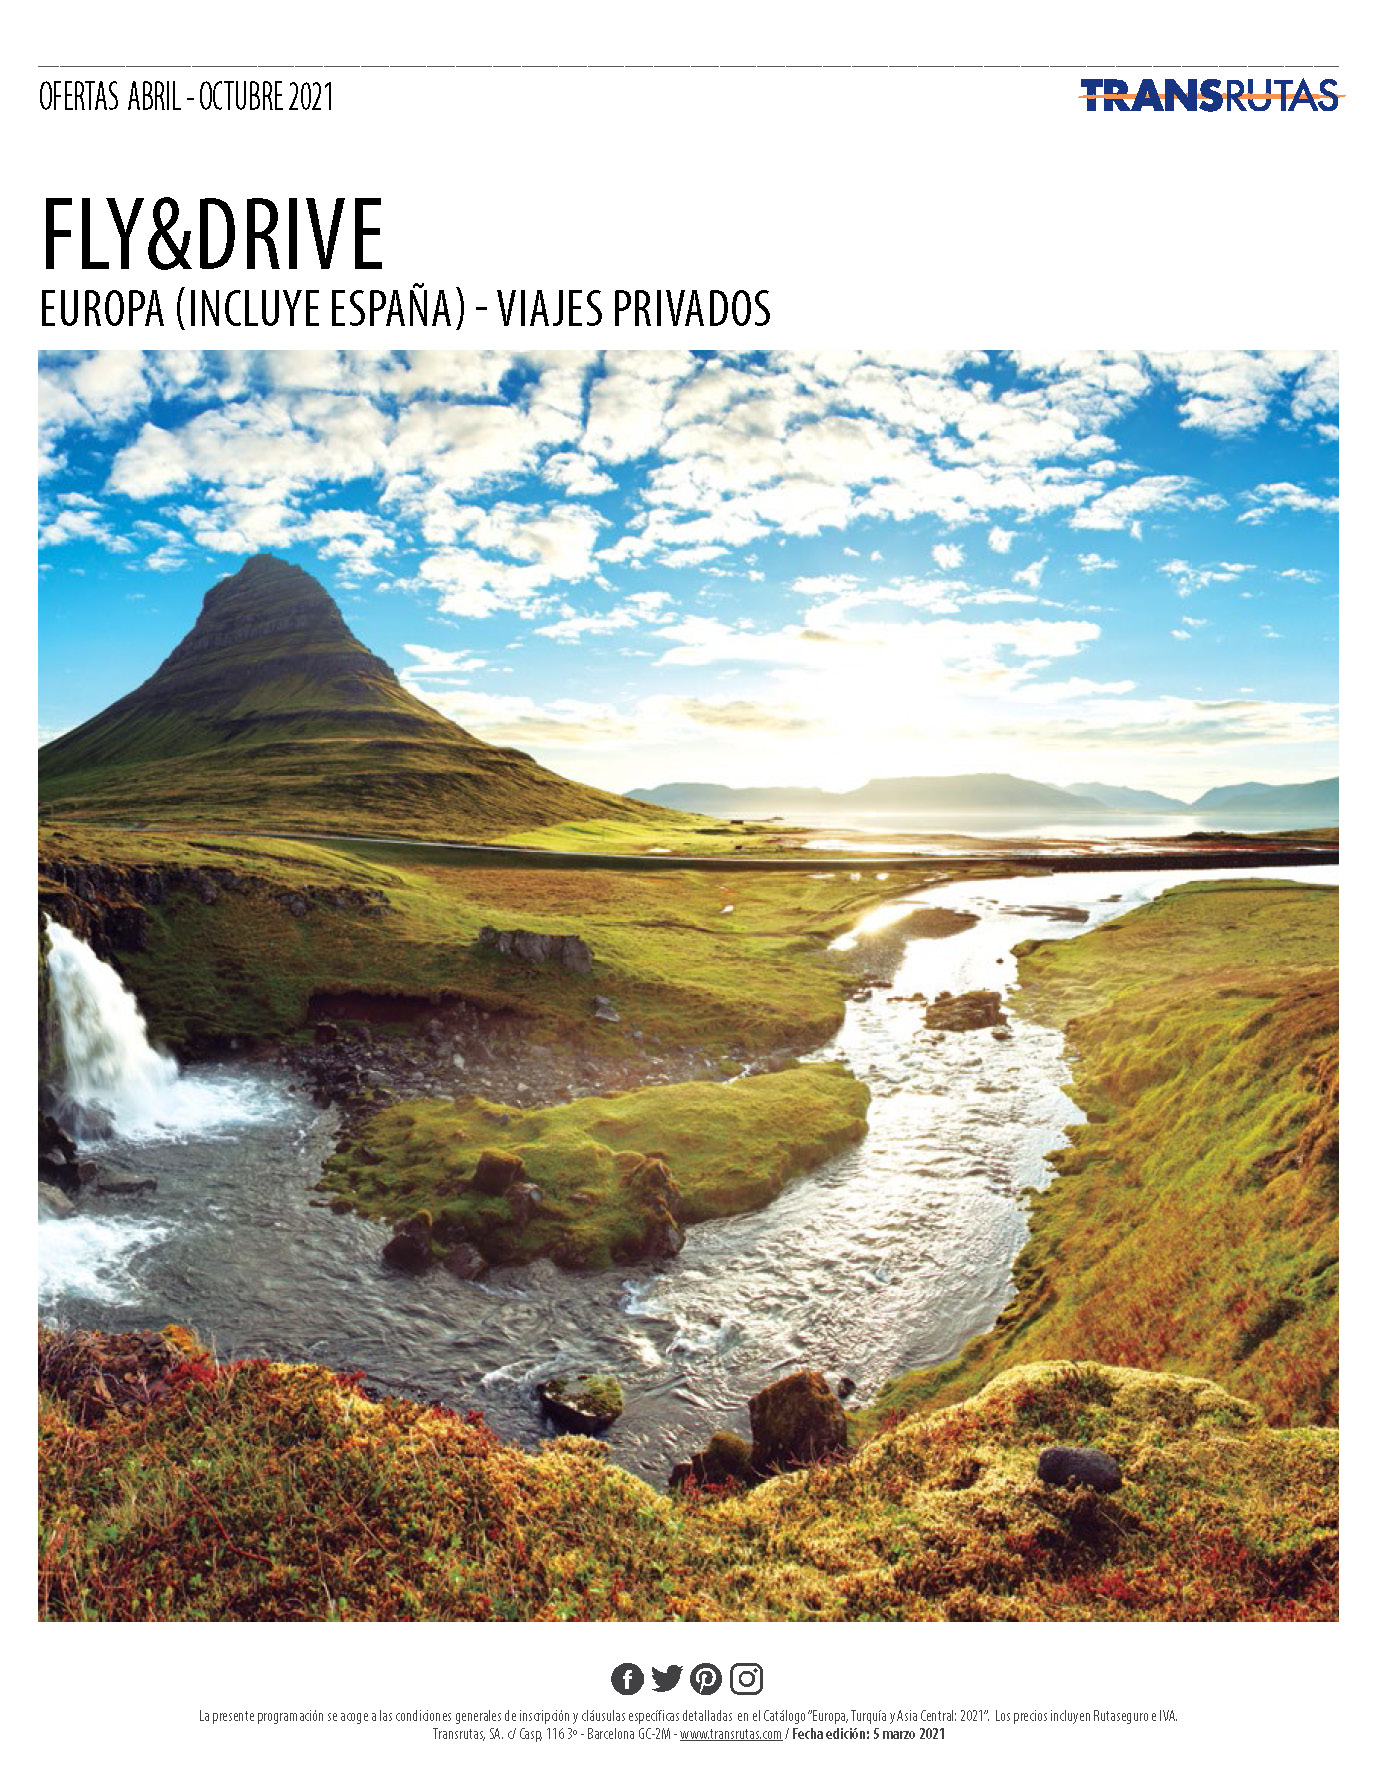 Catalogo Transrutas Circuitos Fly and Drive 2021